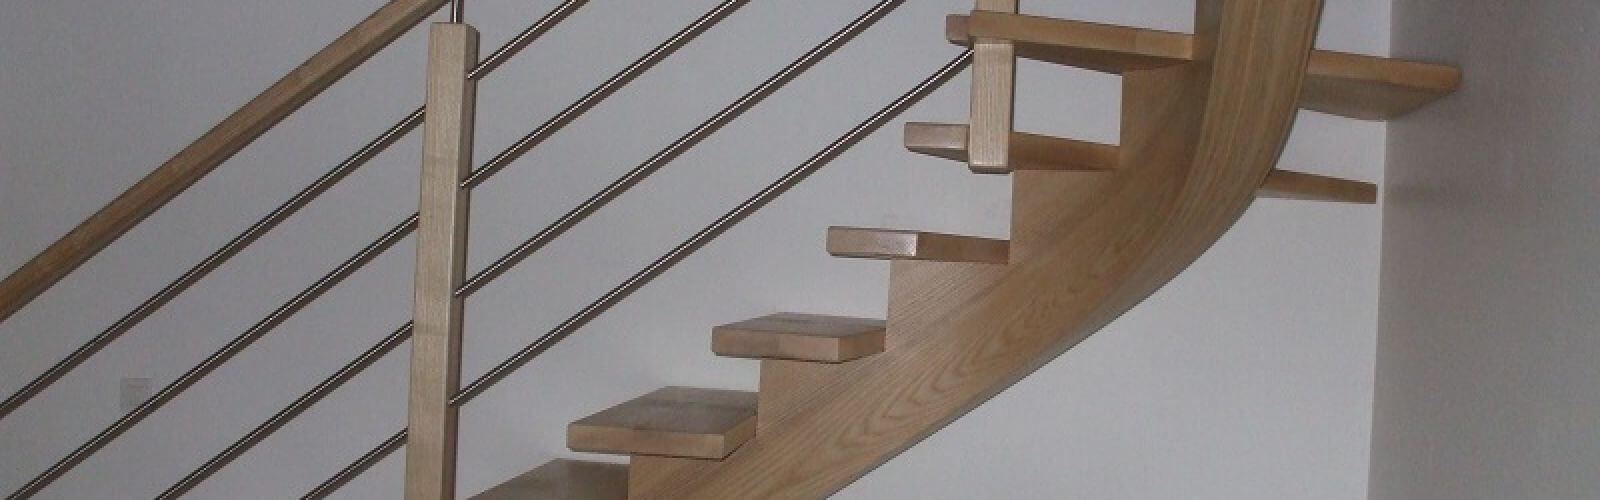 Escalier Couffé